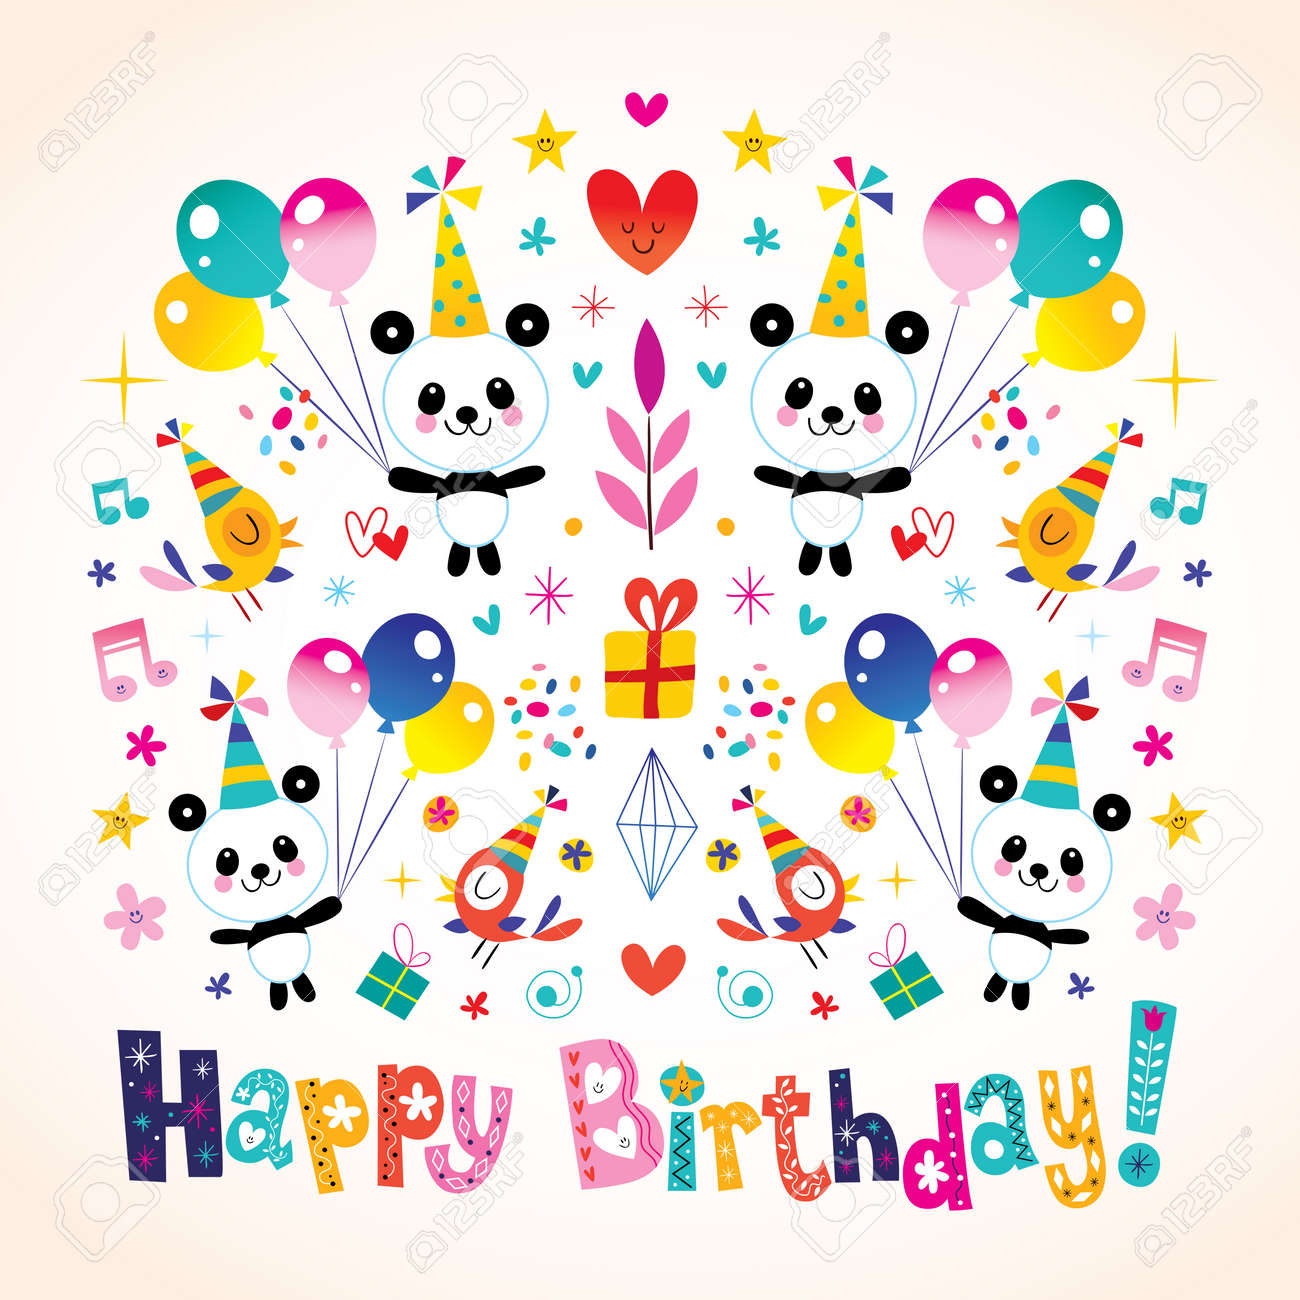 Happy birthday greeting card with cute panda bears royalty free happy birthday greeting card with cute panda bears stock vector 76878557 m4hsunfo